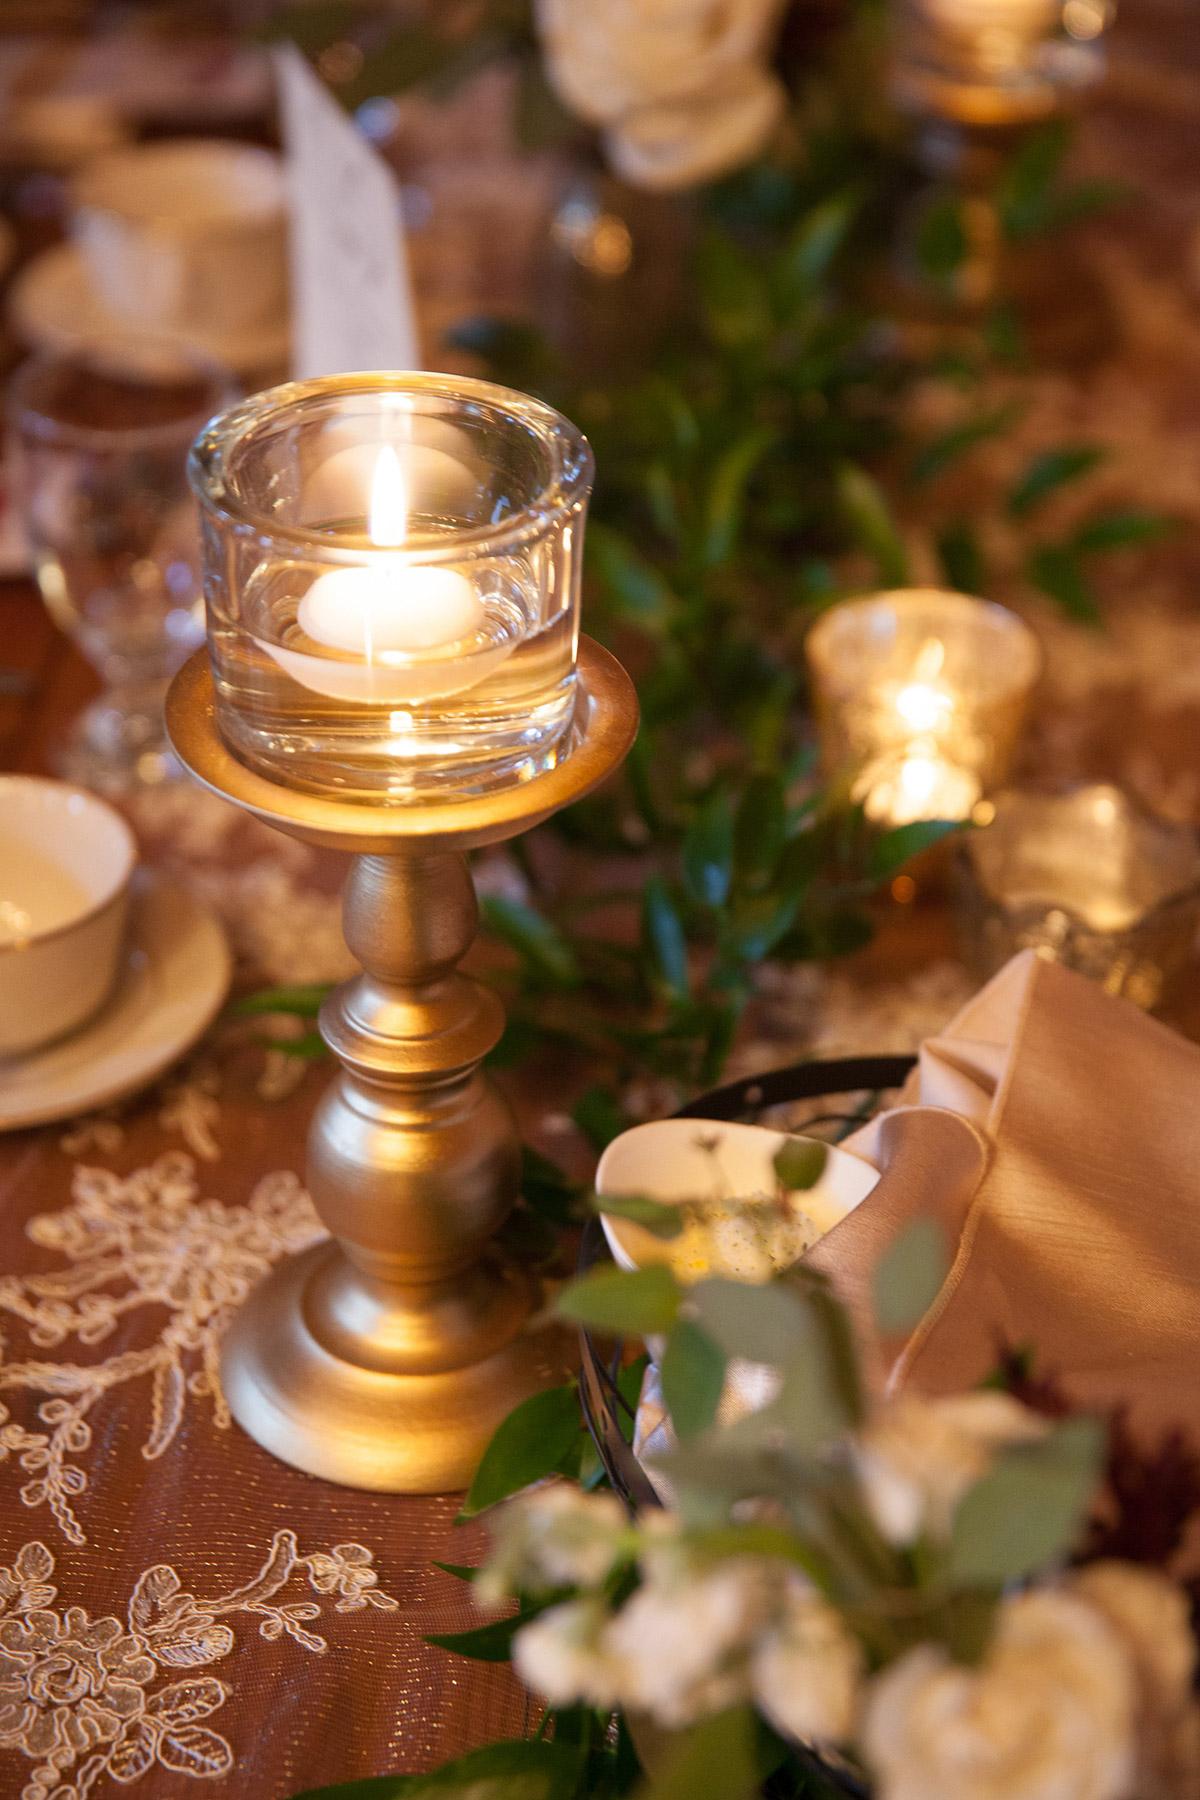 gemini-photography-vineyard-bride-swish-list-honsberger-estates-jordan-wedding-13.jpg